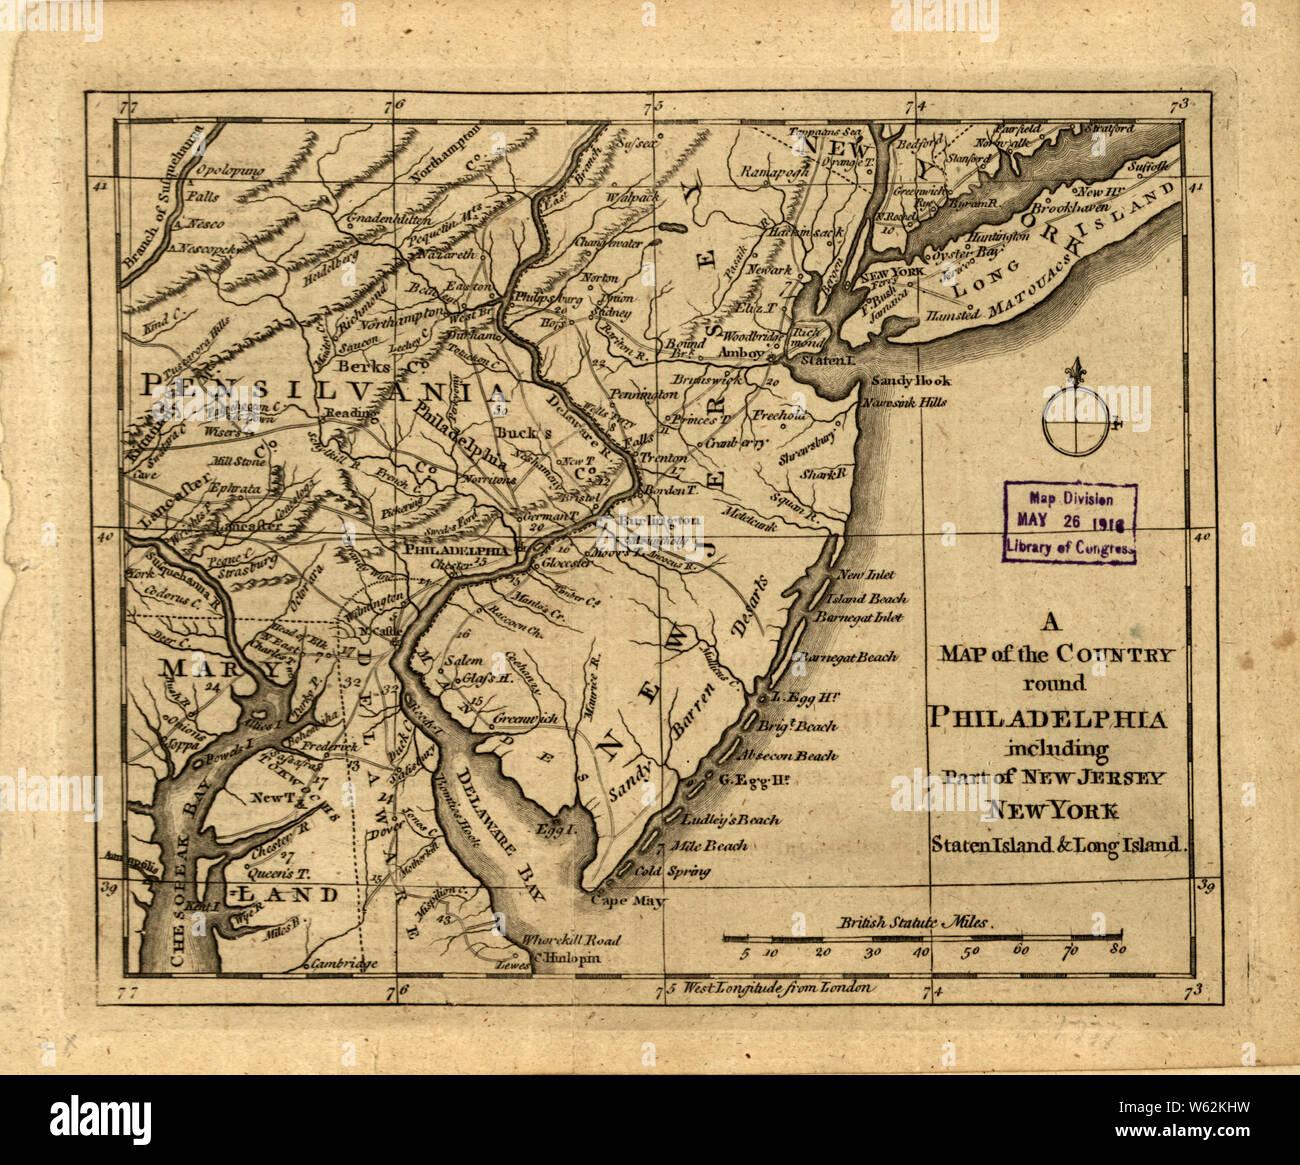 Map Of New York Revolutionary War.American Revolutionary War Era Maps 1750 1786 088 A Map Of The